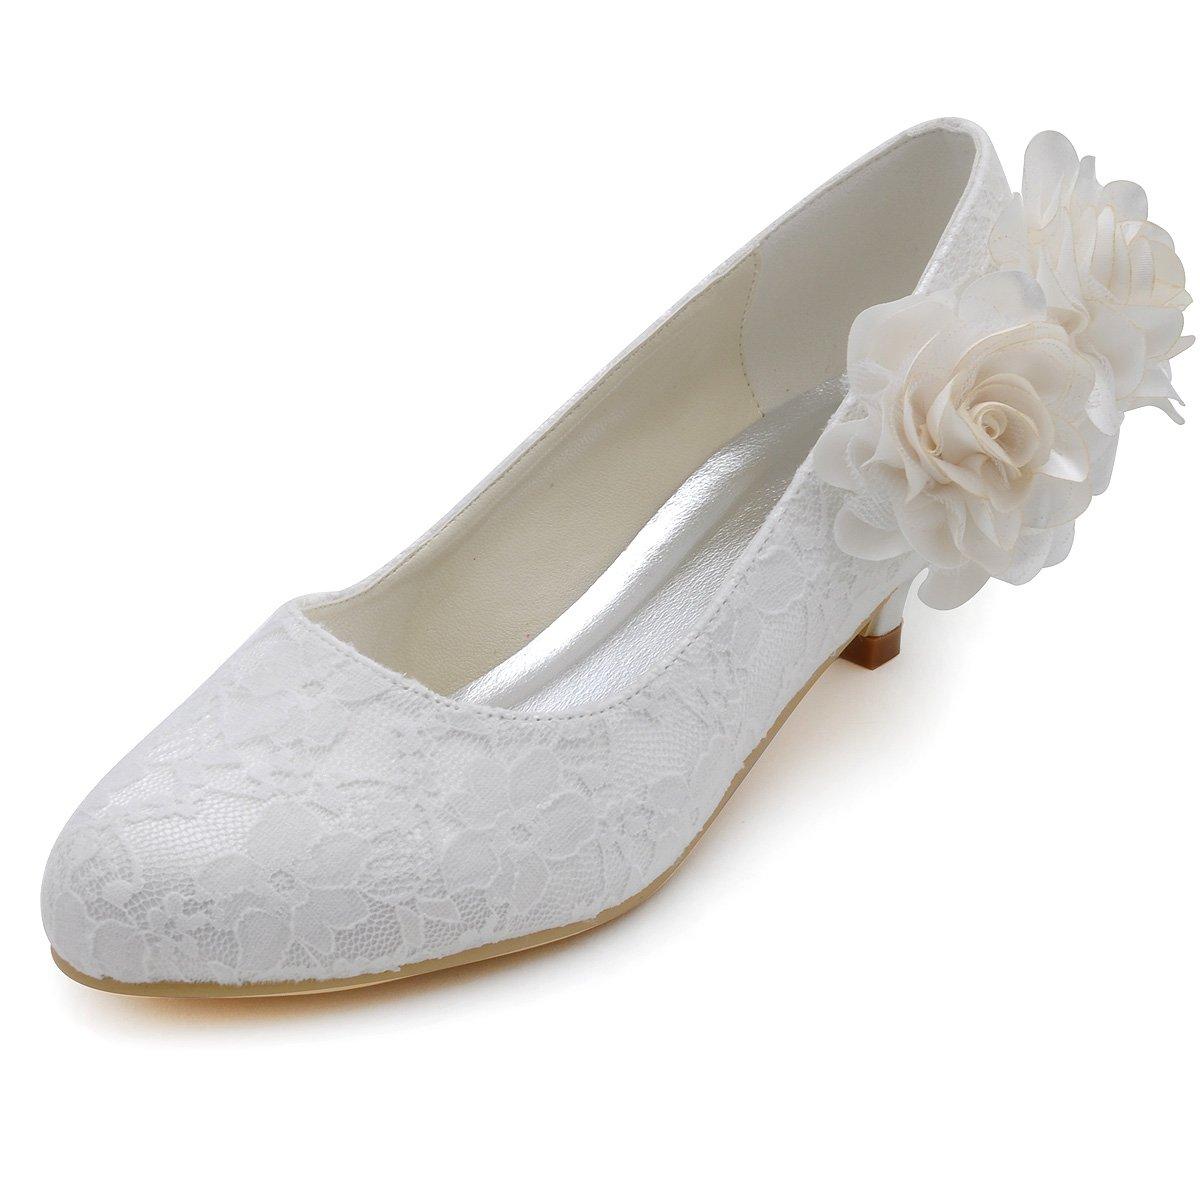 ElegantPark EP2130 Women Low Heel Comfort Closed Toe Flowers Lace Bridal Wedding Shoes Ivory US 10